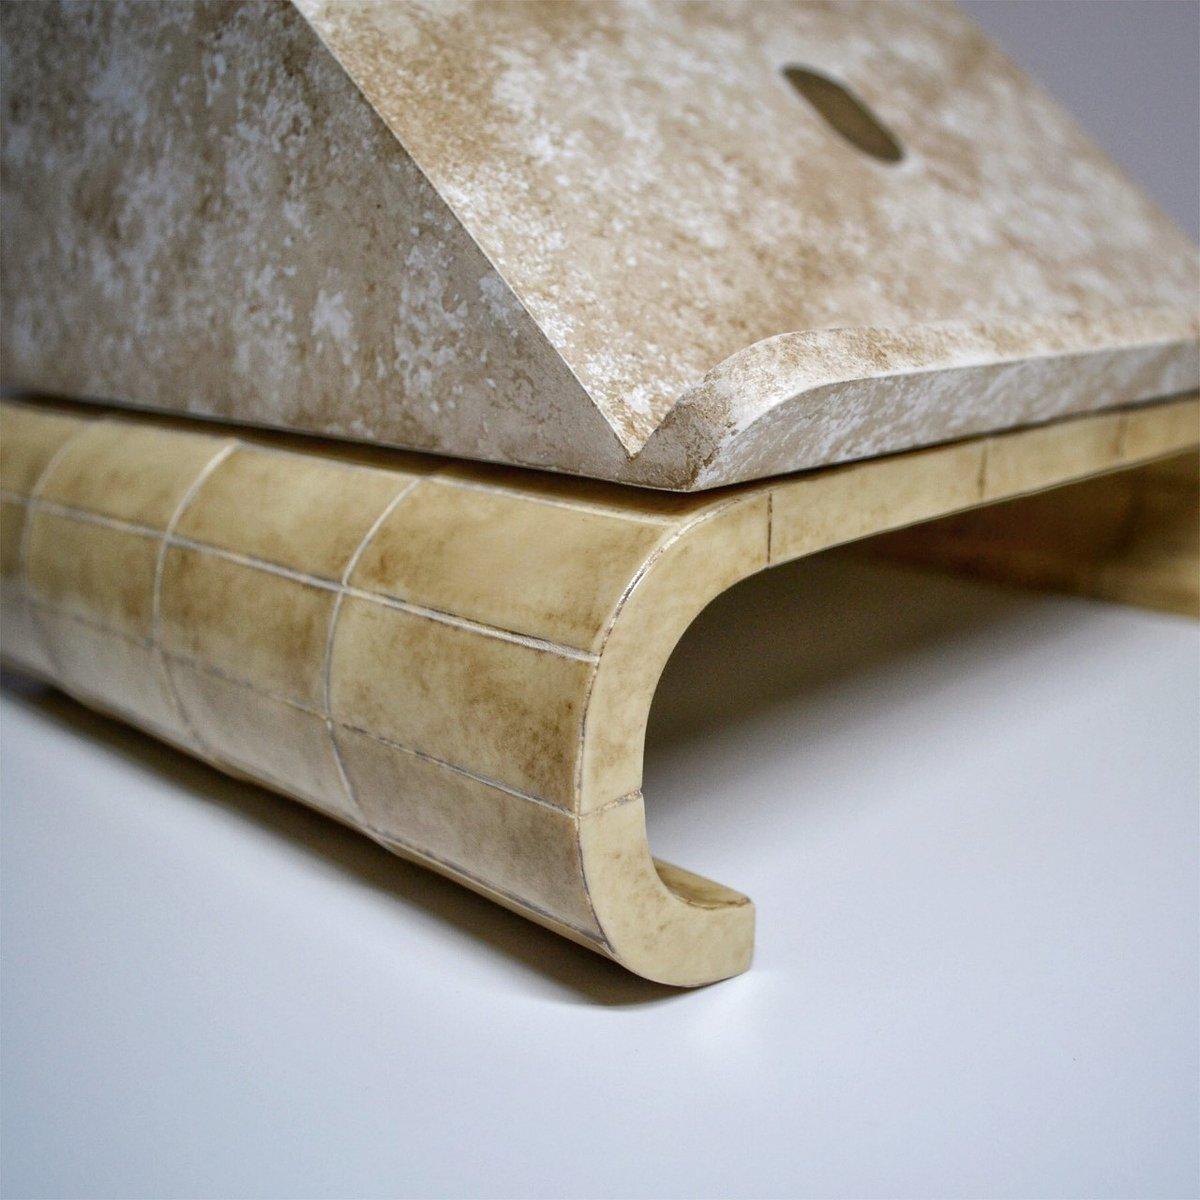 Image of Donovan's lectern